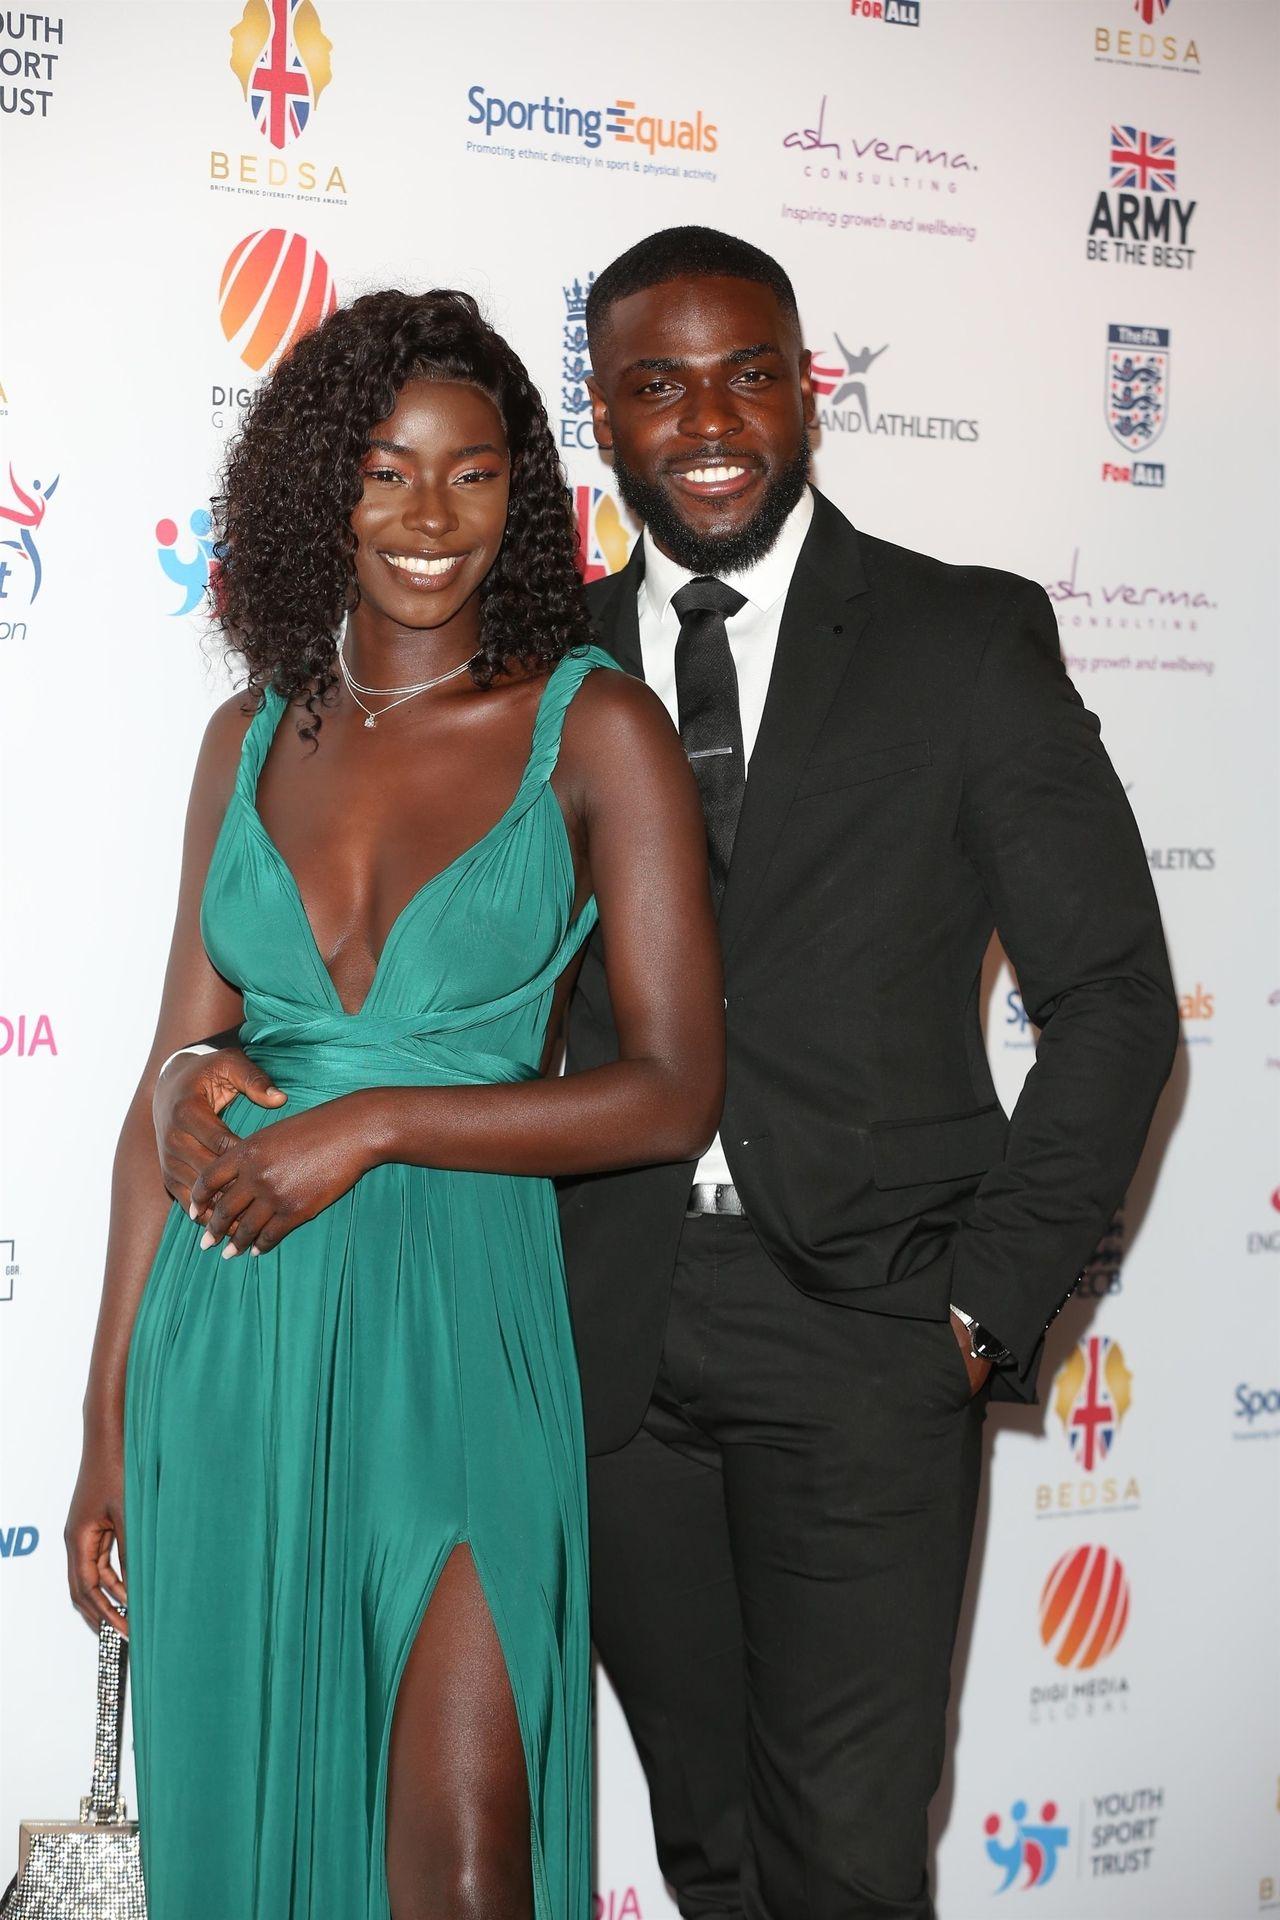 Mike Boateng & Priscilla Anyabu Are Seen At British Ethnic Diversity Sports Awards 0049